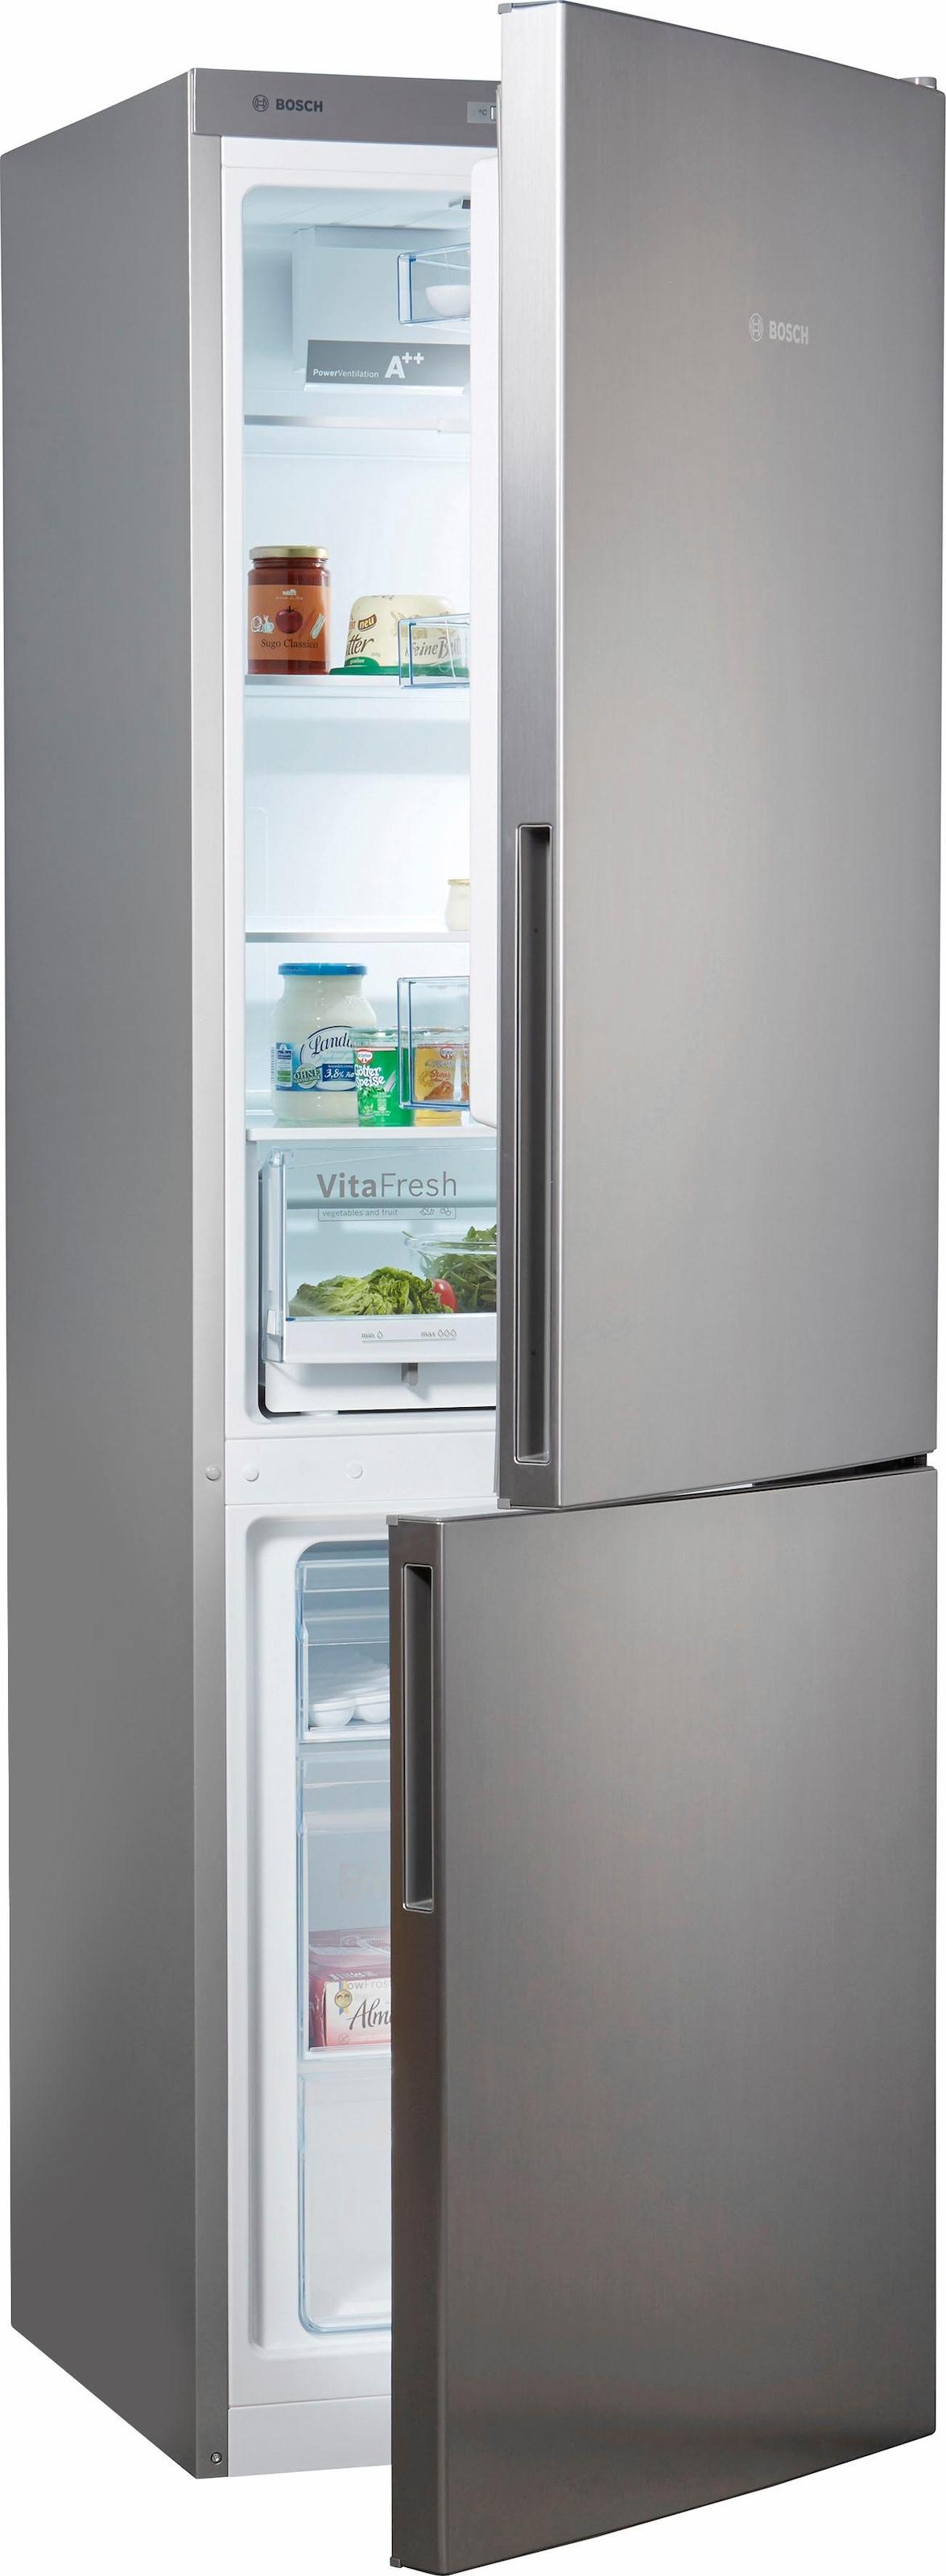 Bosch Kühlschrank Hydrofresh : Bosch kühlschränke online shop bosch kühlschränke online kaufen